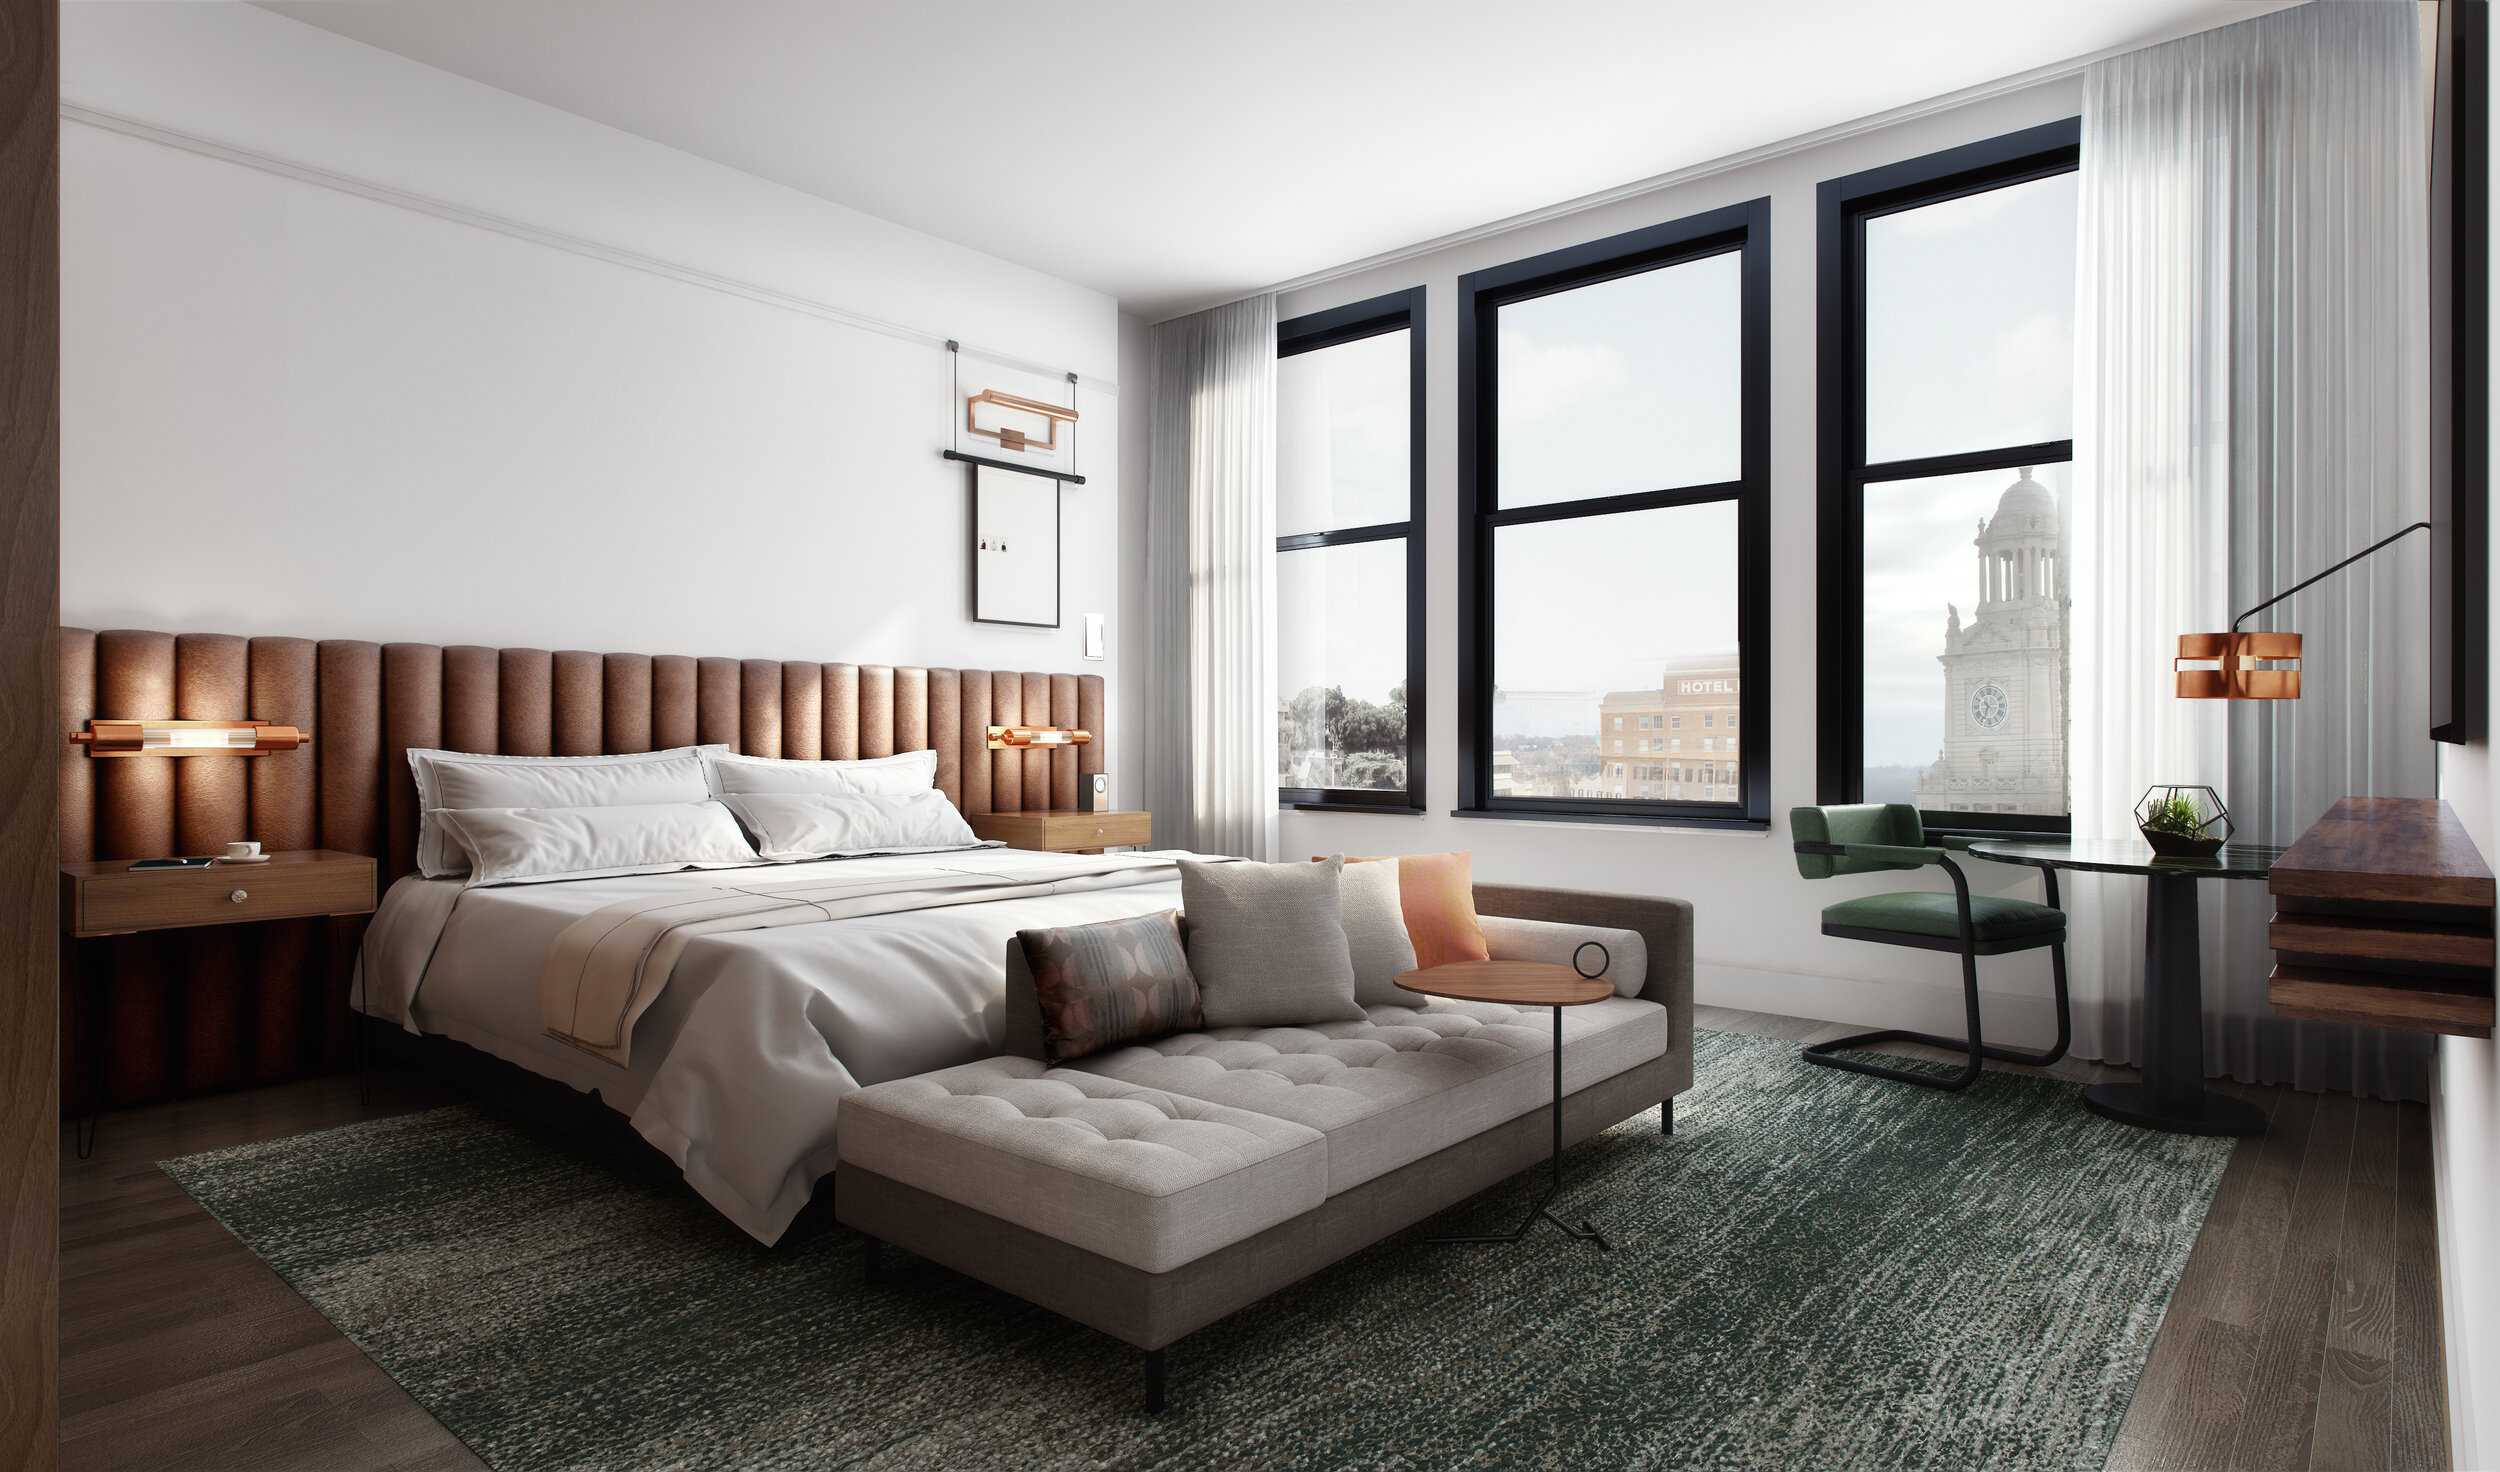 Des Moines Hotel Bedroom